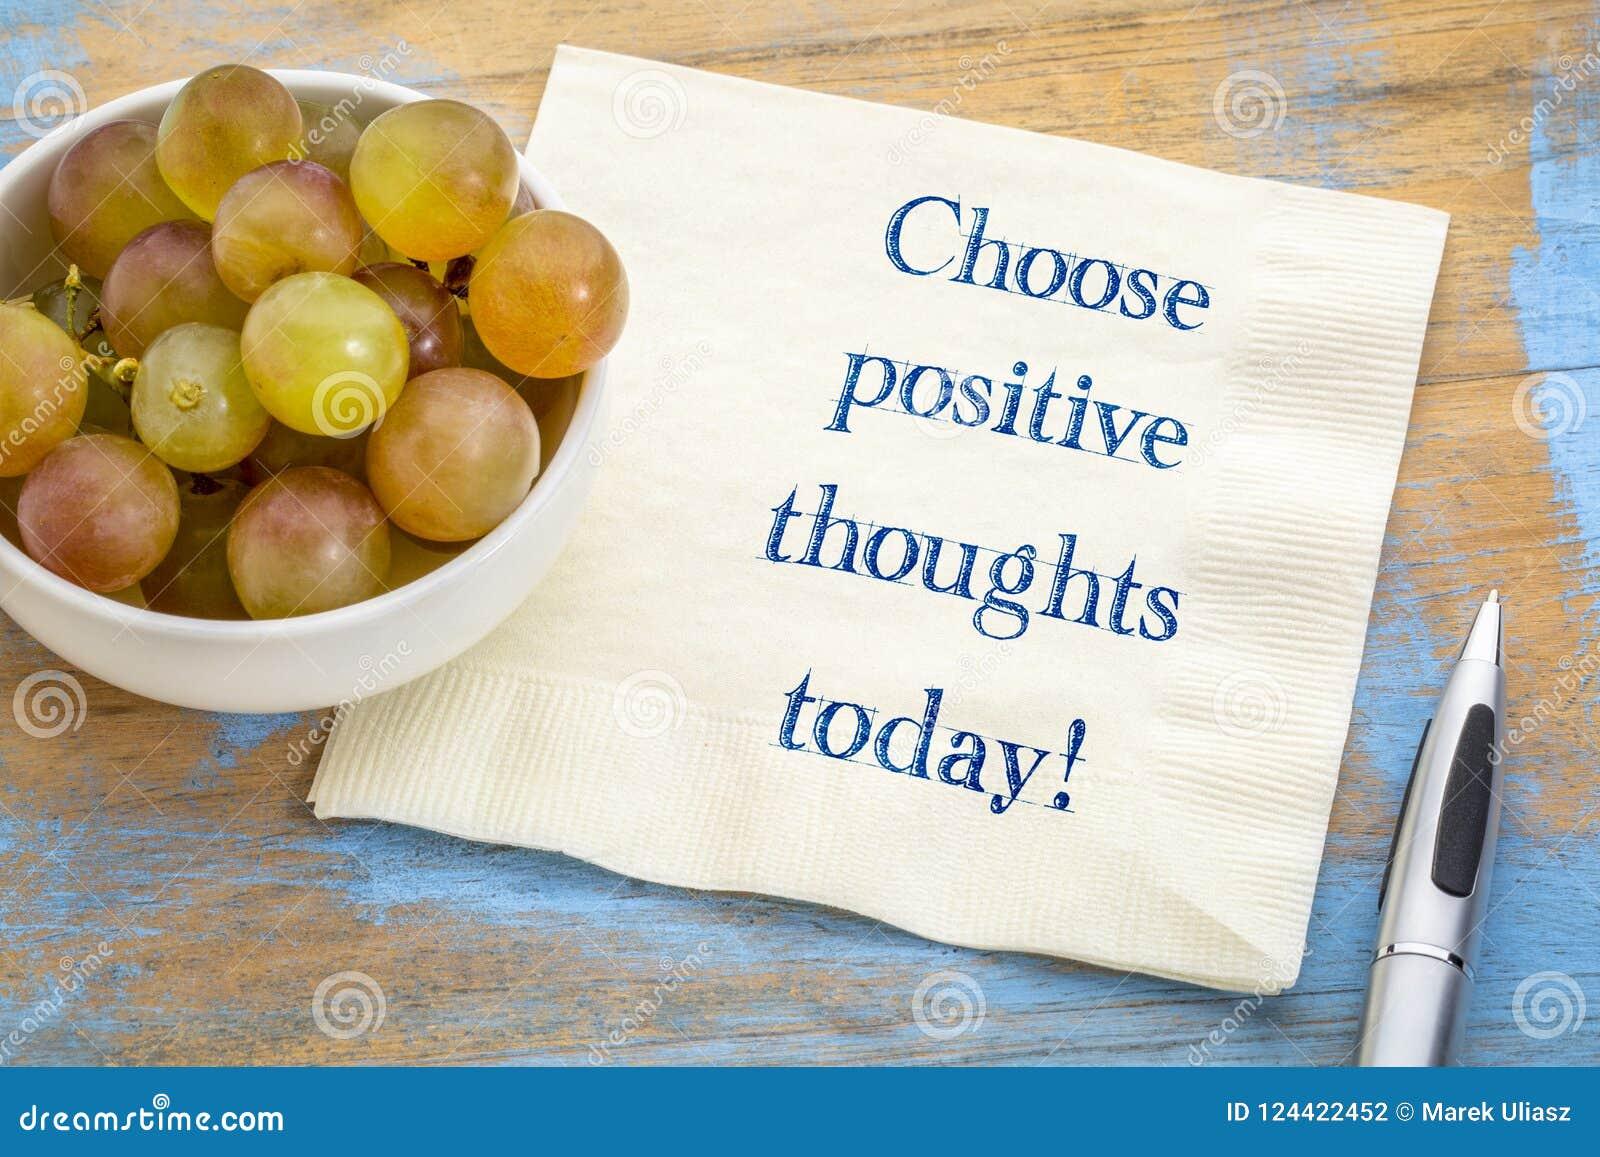 Scelga oggi i pensieri positivi!